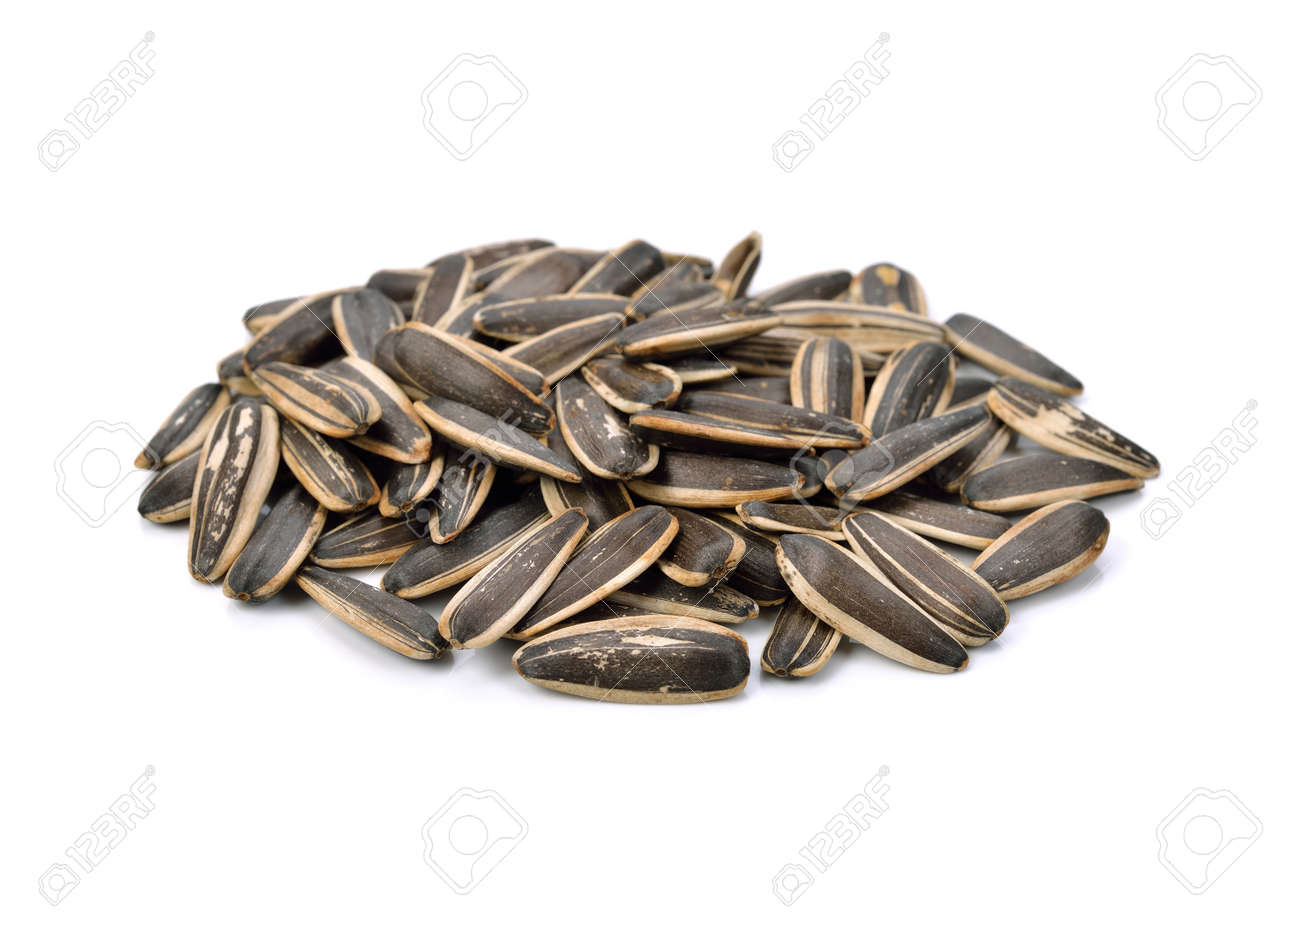 Sunflower seeds isolated on white background - 169847561